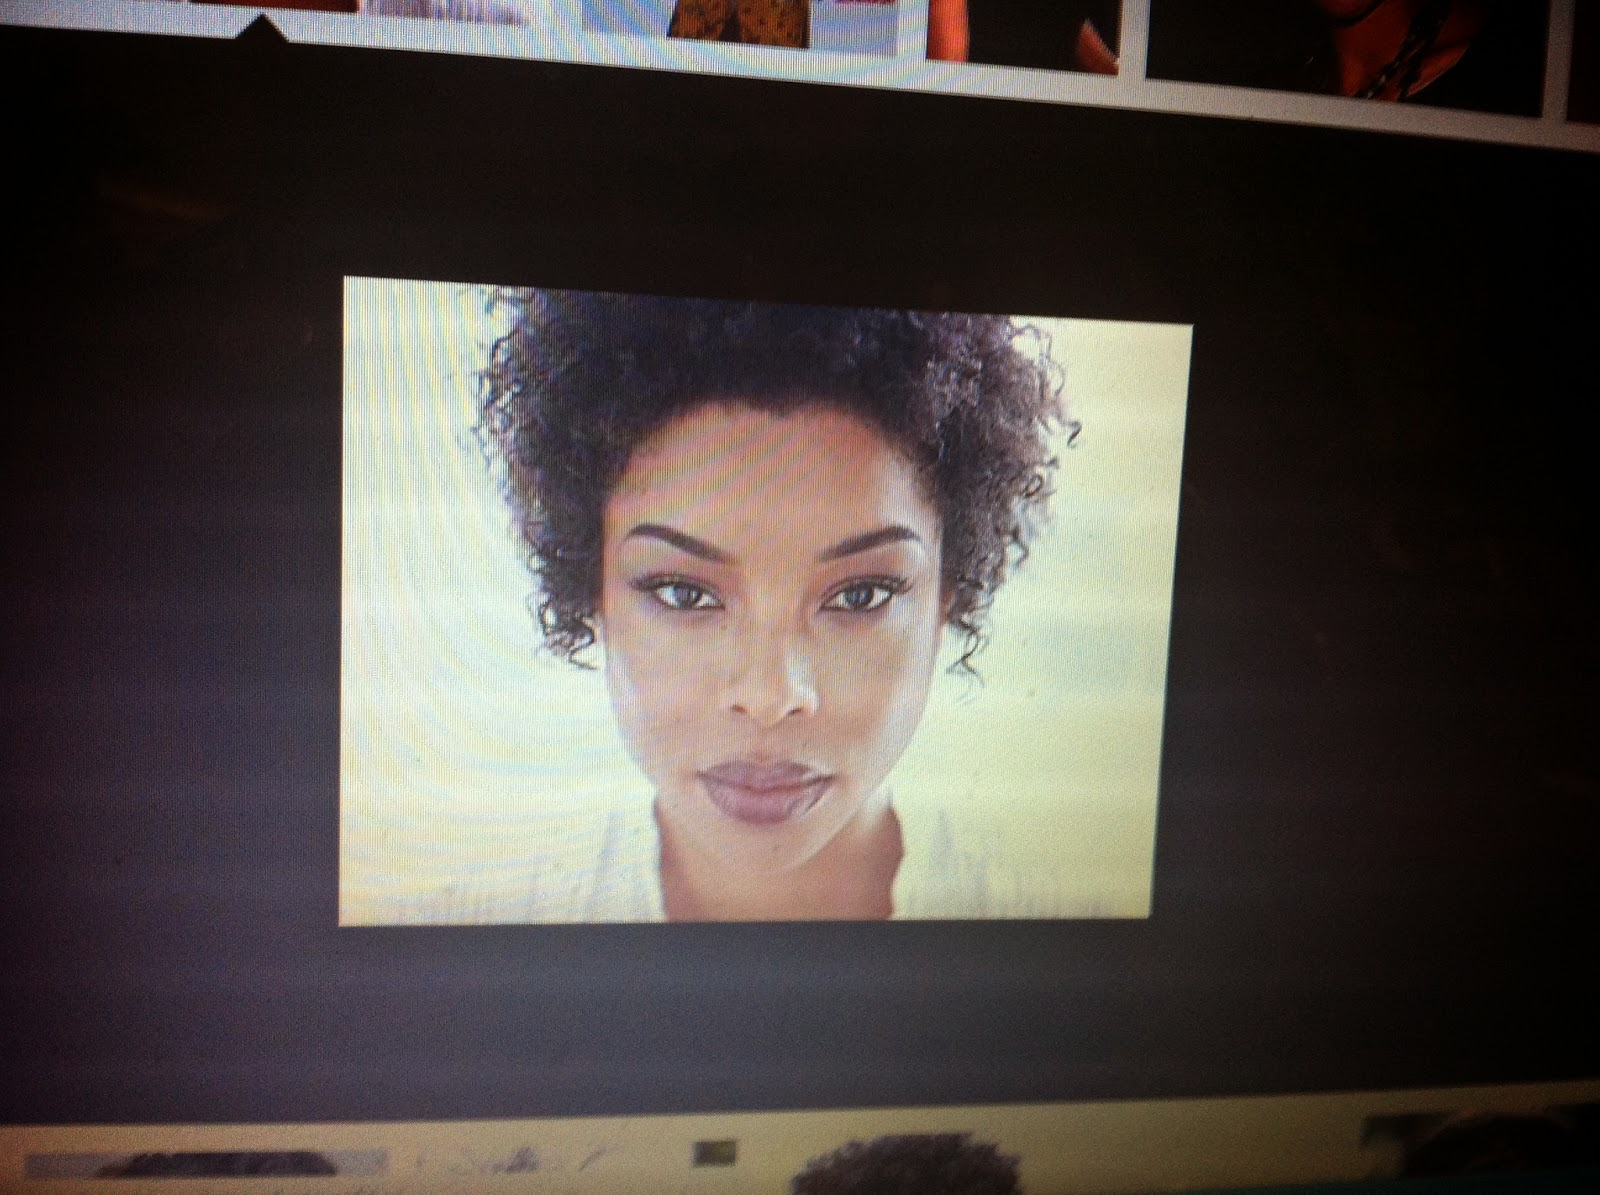 foto Sophie Okonedo (born 1968)